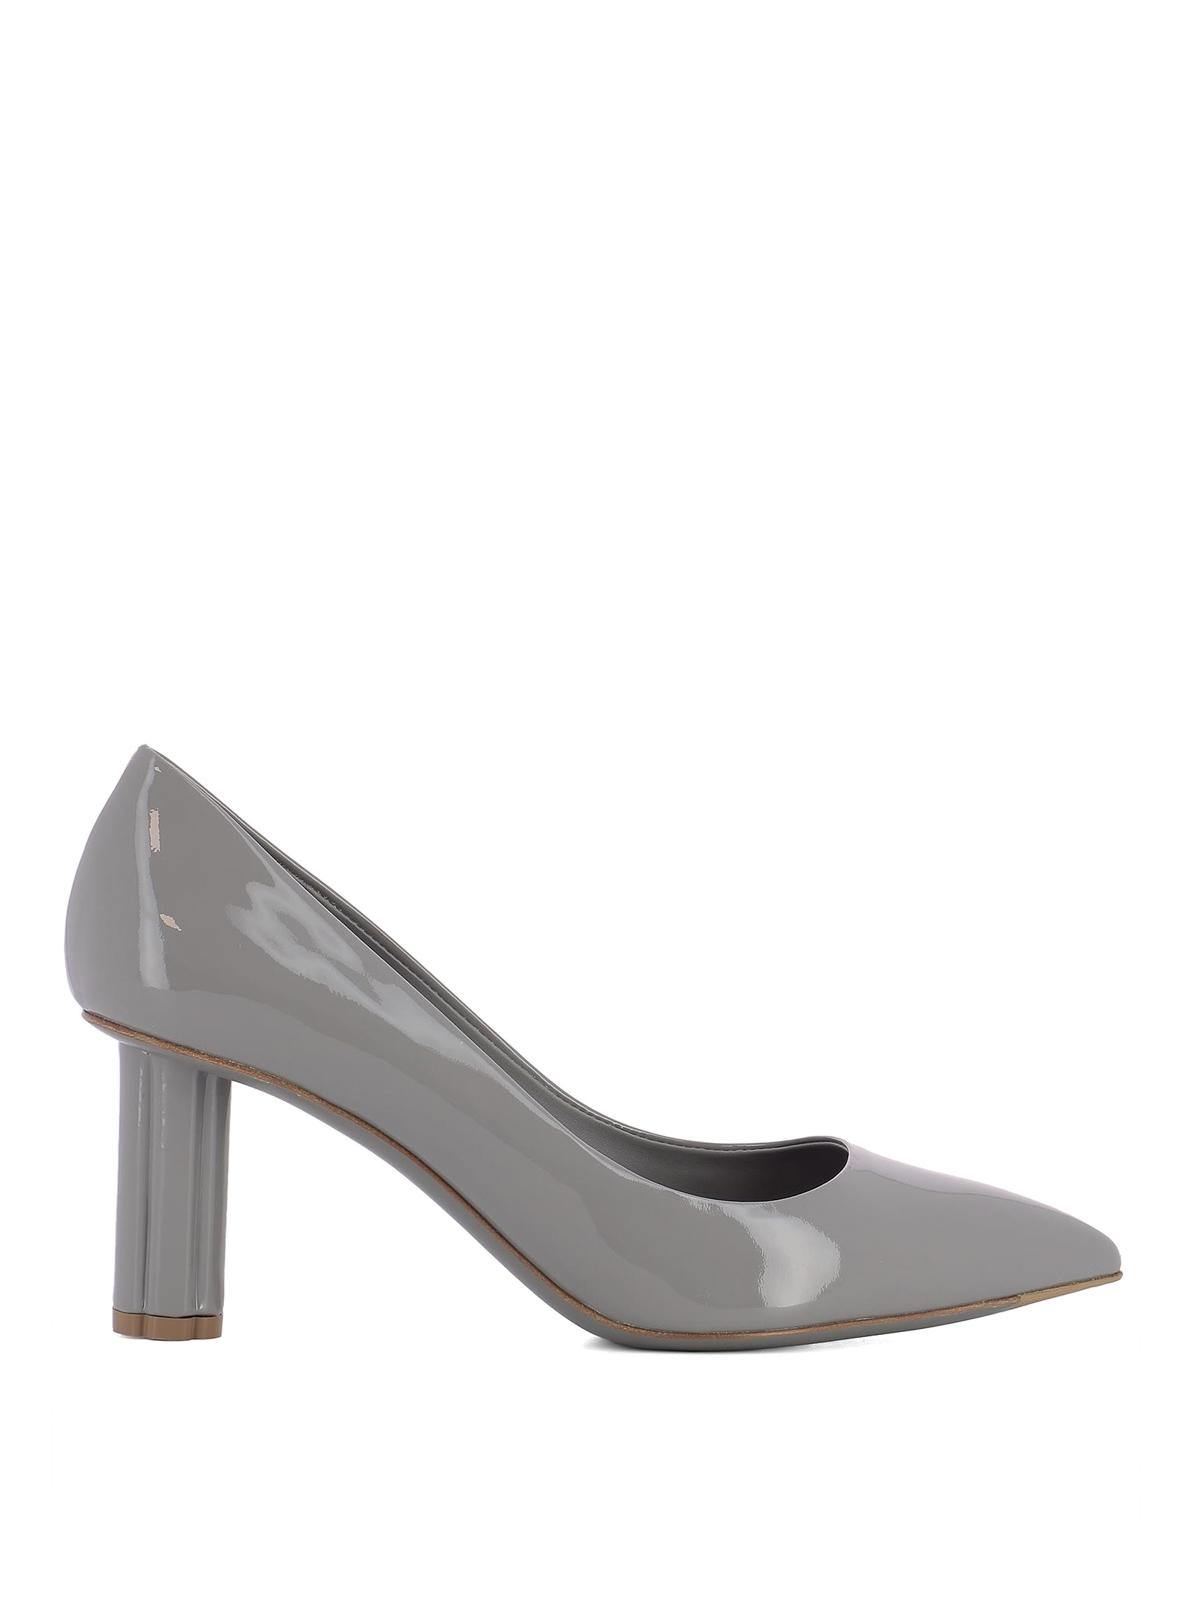 939ce733b9cdc Salvatore Ferragamo - Badia 70 patent pumps - court shoes - 686609